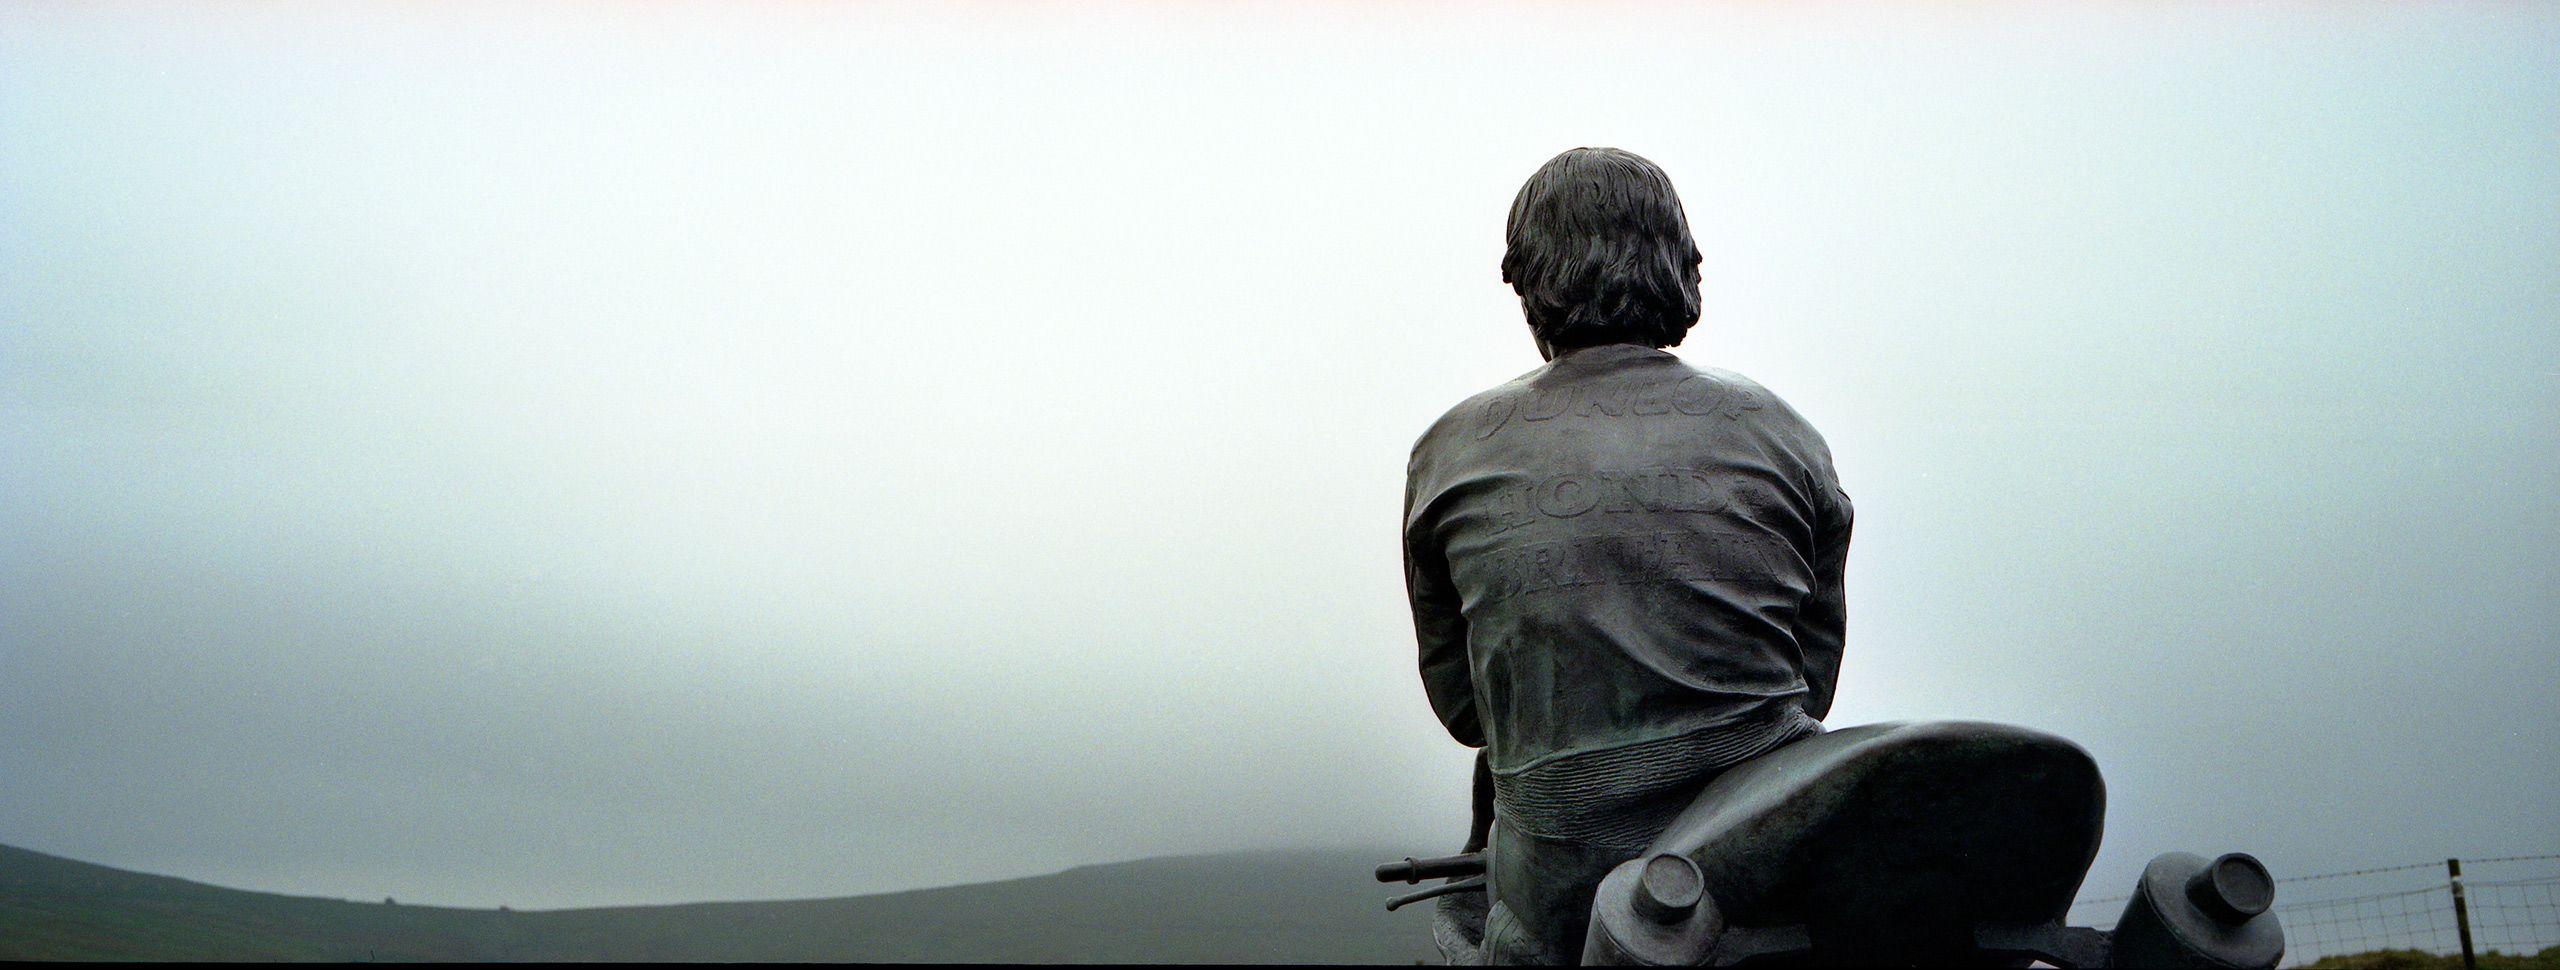 Statue of Legendary TT rider Joey Dunlop on the Isle of Mann.